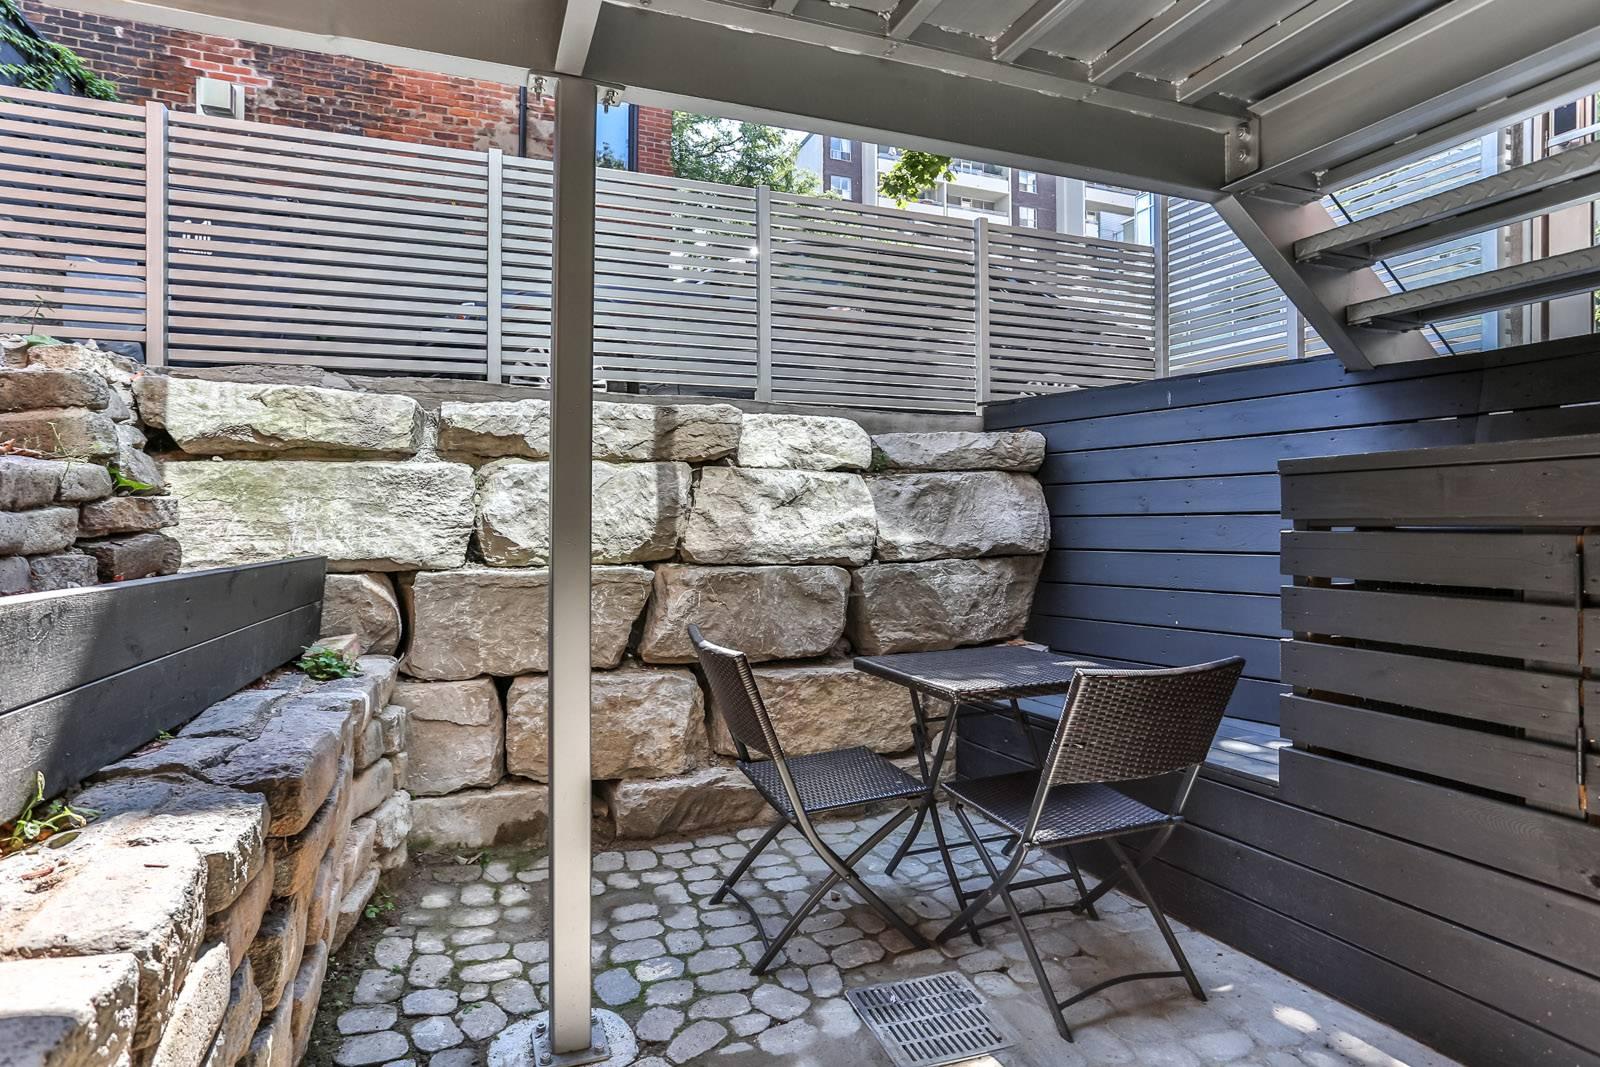 115 Maitland Street patio and brick wall.